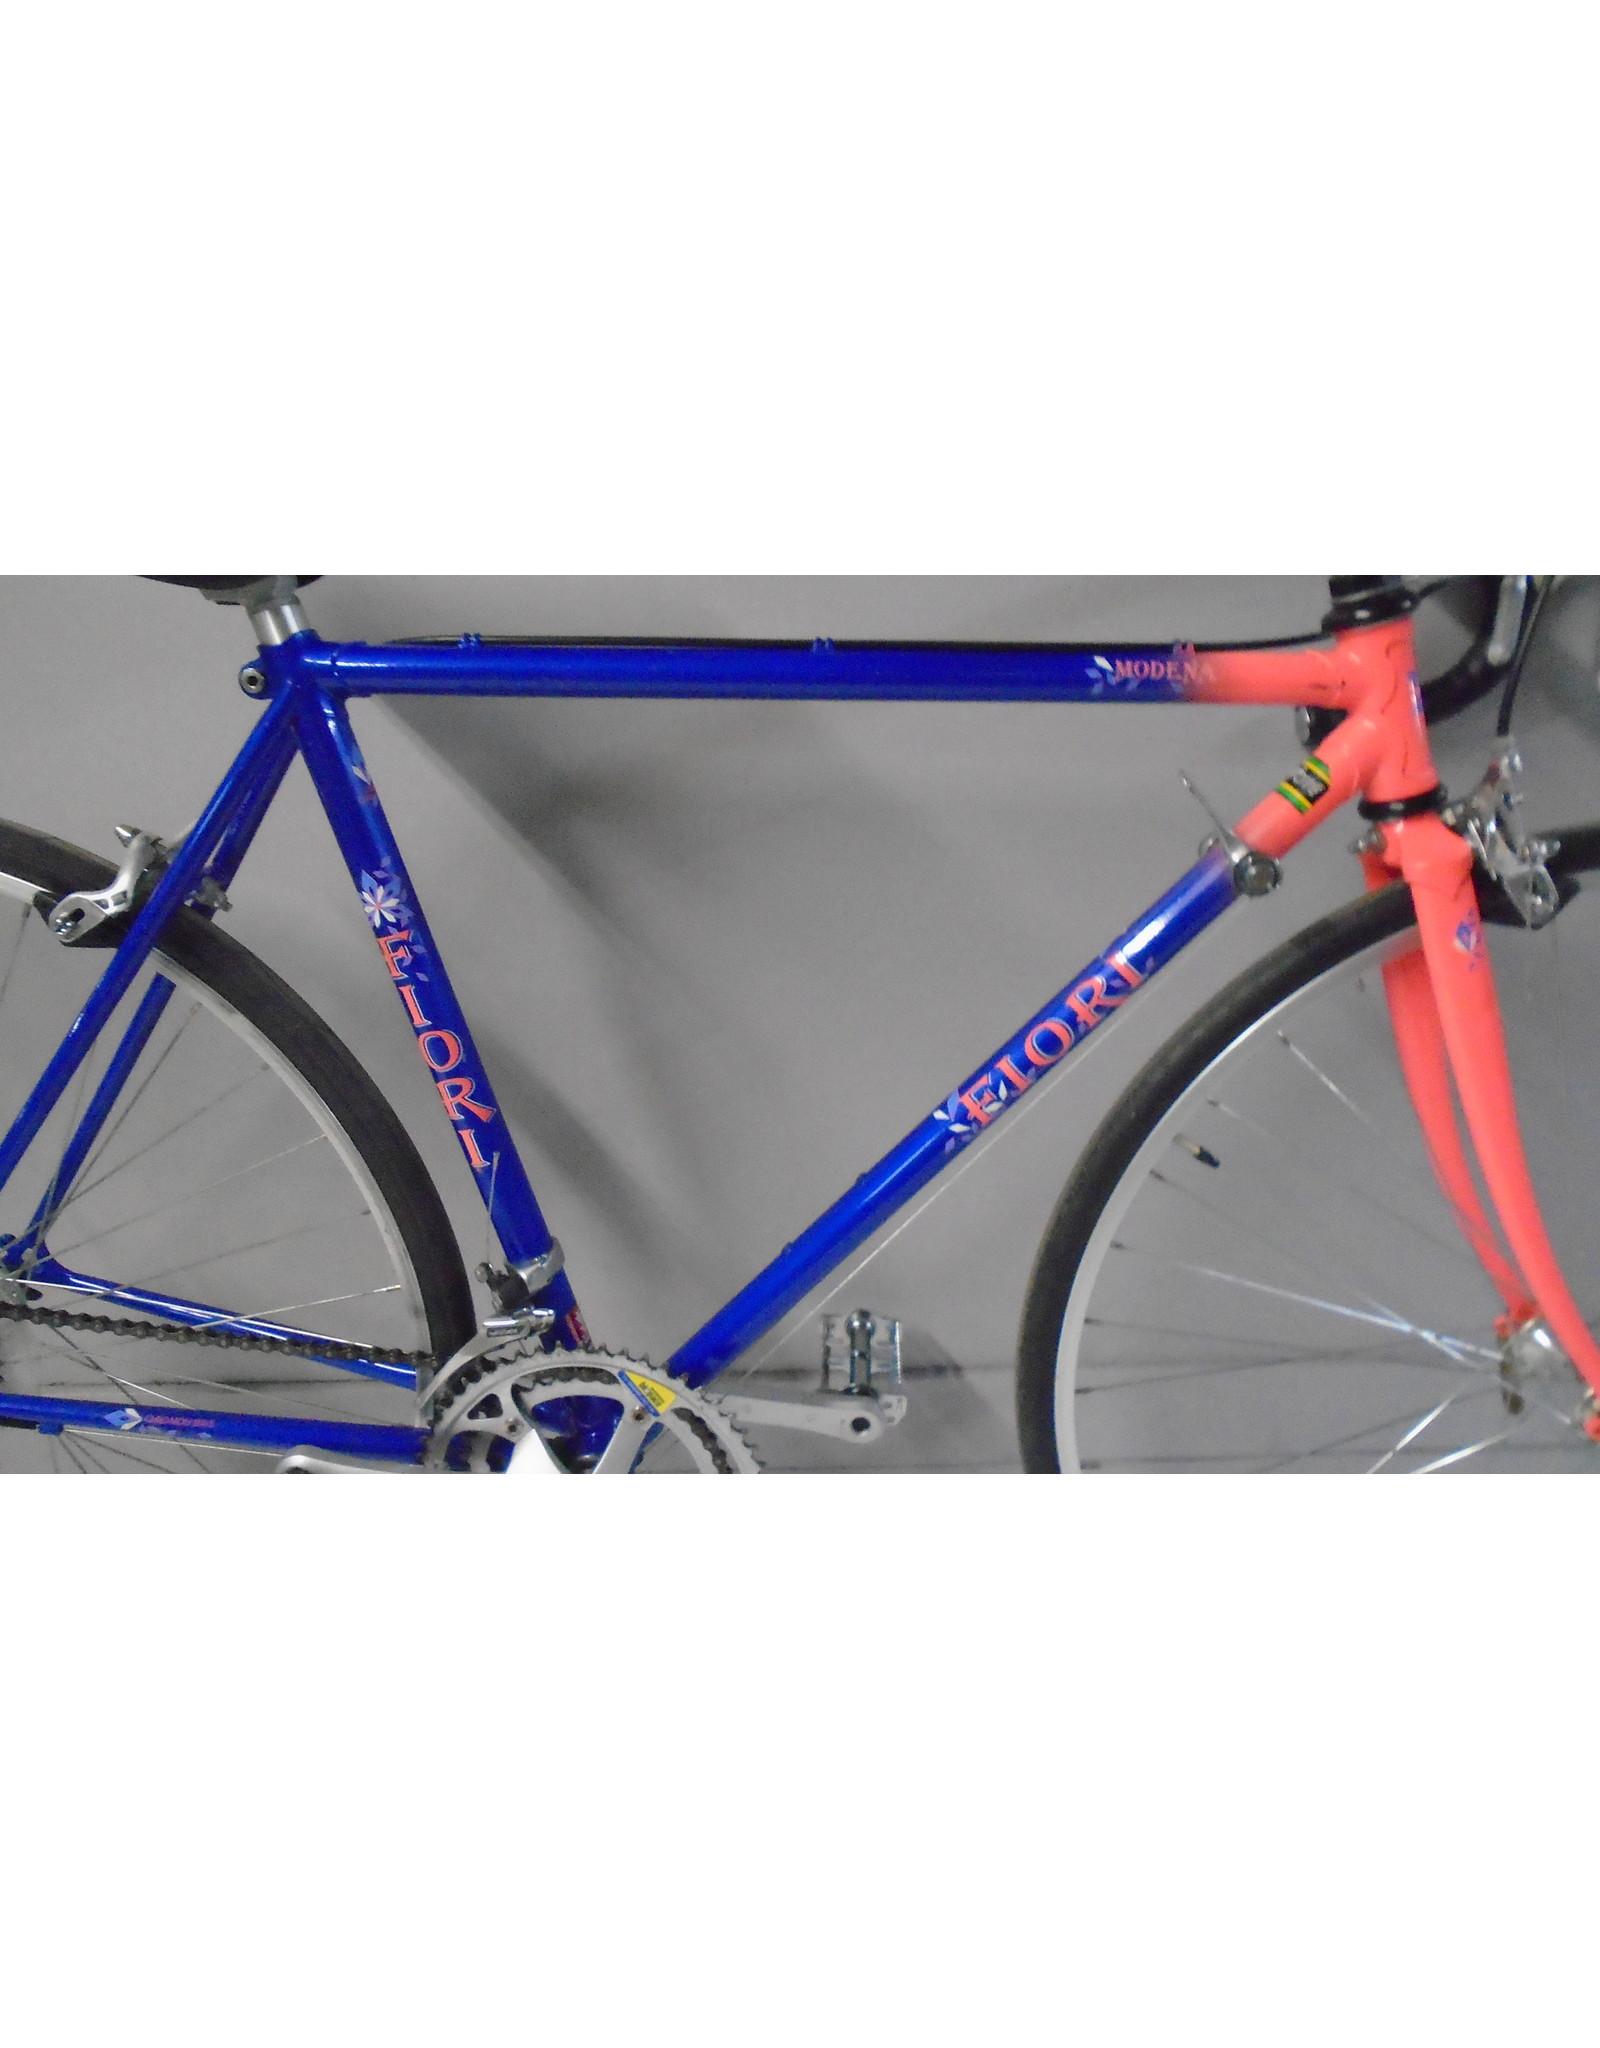 "Vélo usagé de route Fiori 20"" - 11293"